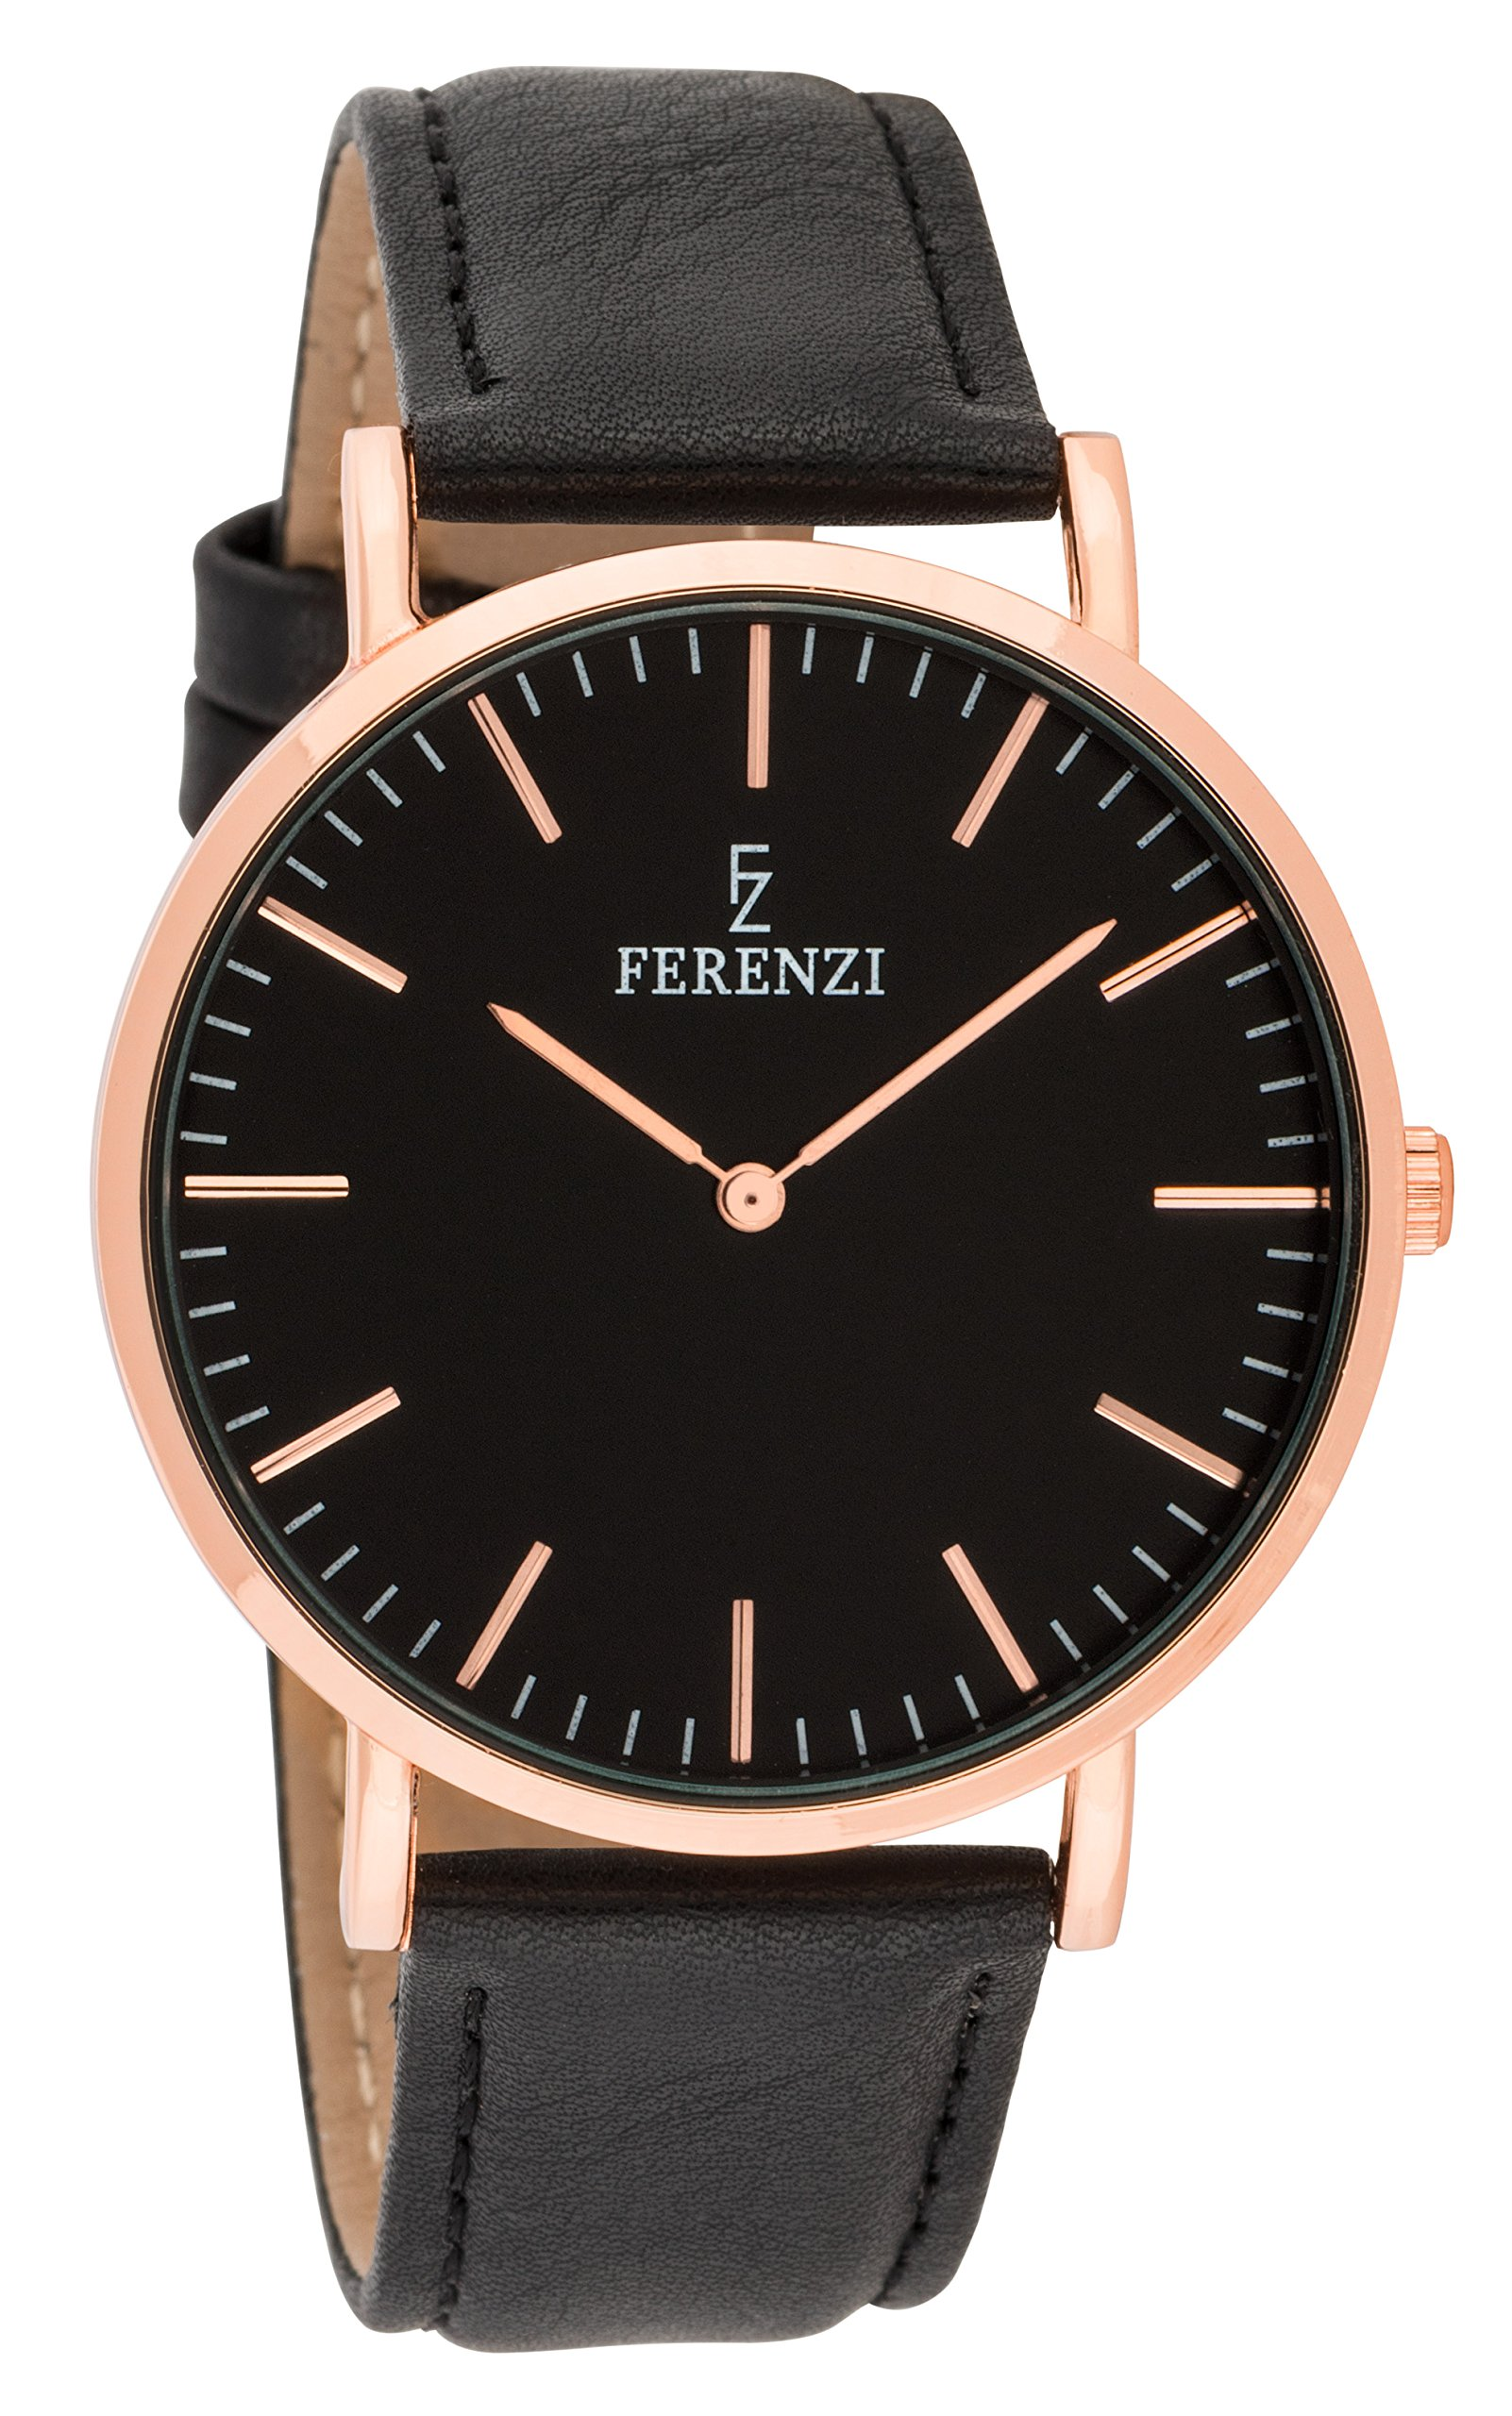 Ferenzi Unisex - FZ18602 - Classic Rose Gold-Tone and Black on Black Leather Watch